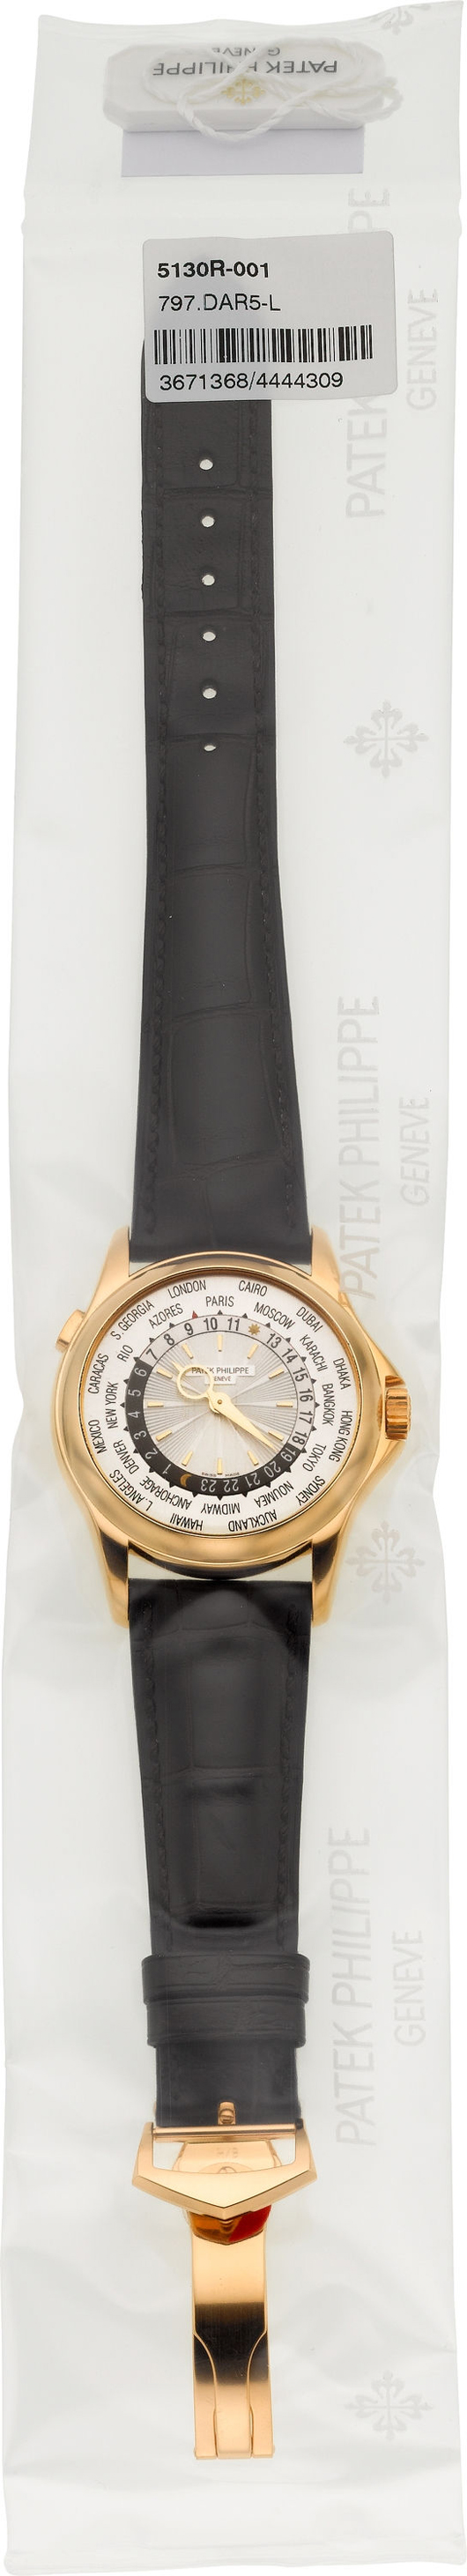 New Patek Philippe single sealed Ref. 5130R-001 rose gold World Time wristwatch. Estimate: $27,500-plus. Heritage Auctions image.